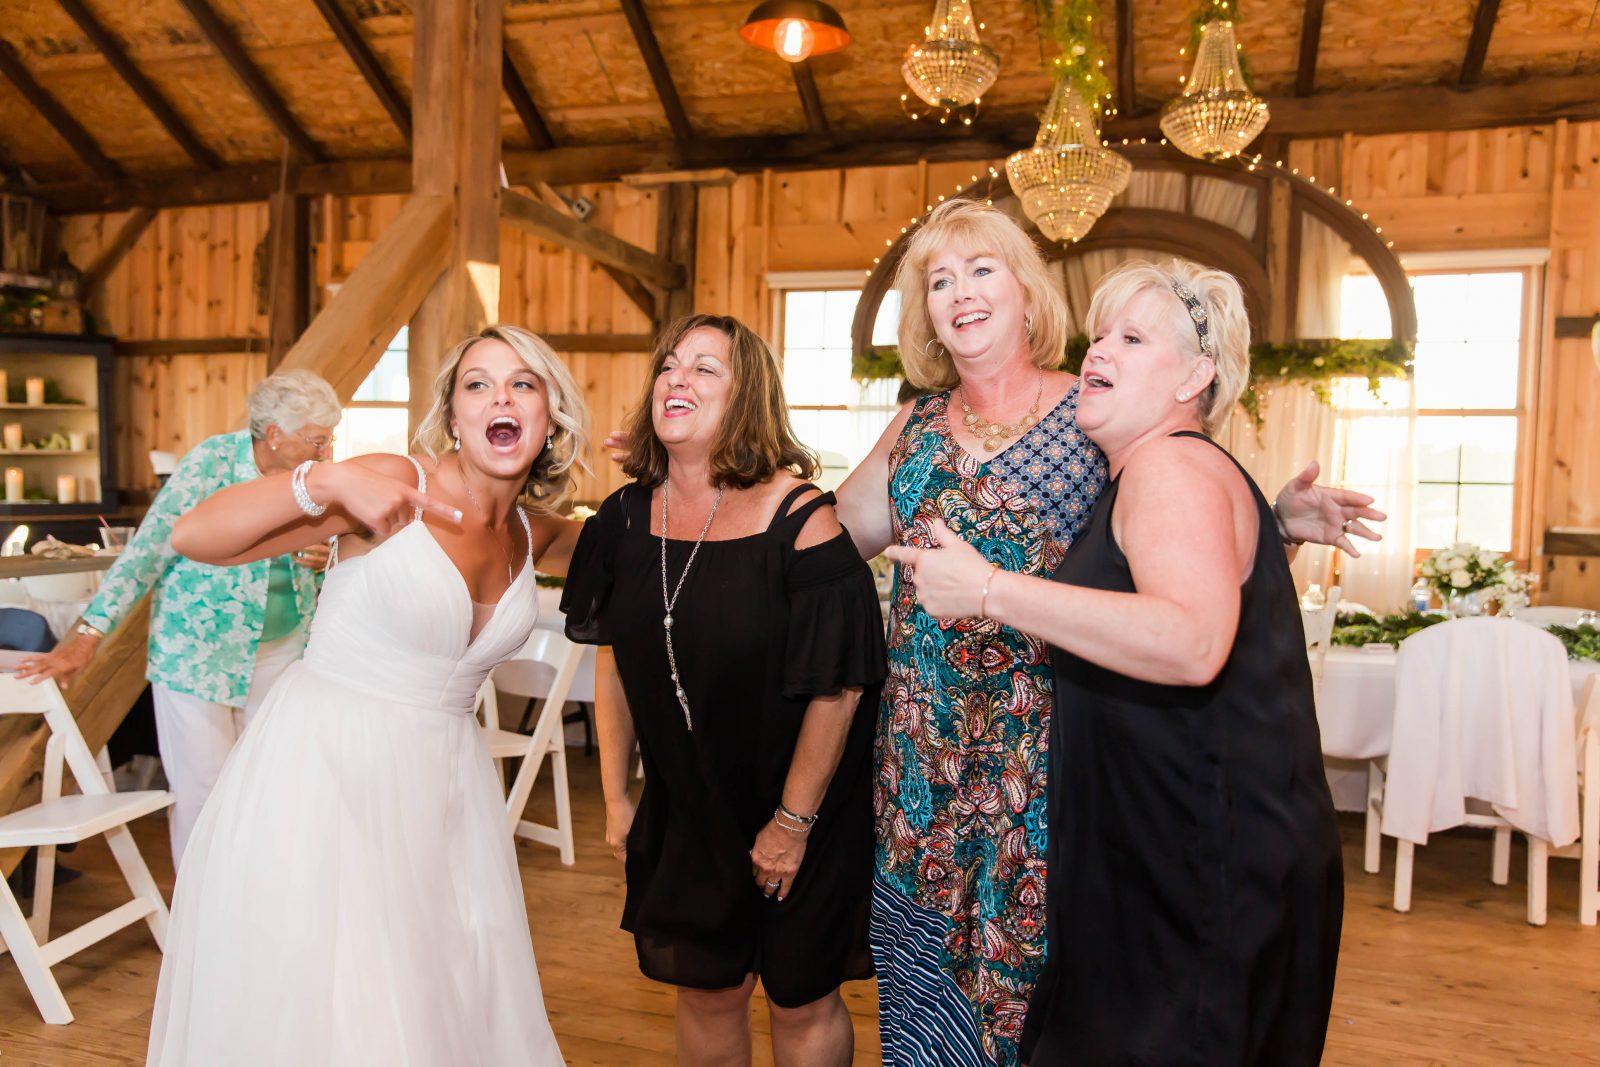 peacock-ridge-summer-wedding-photographer-akron-ohio-loren-jackson-photography-110